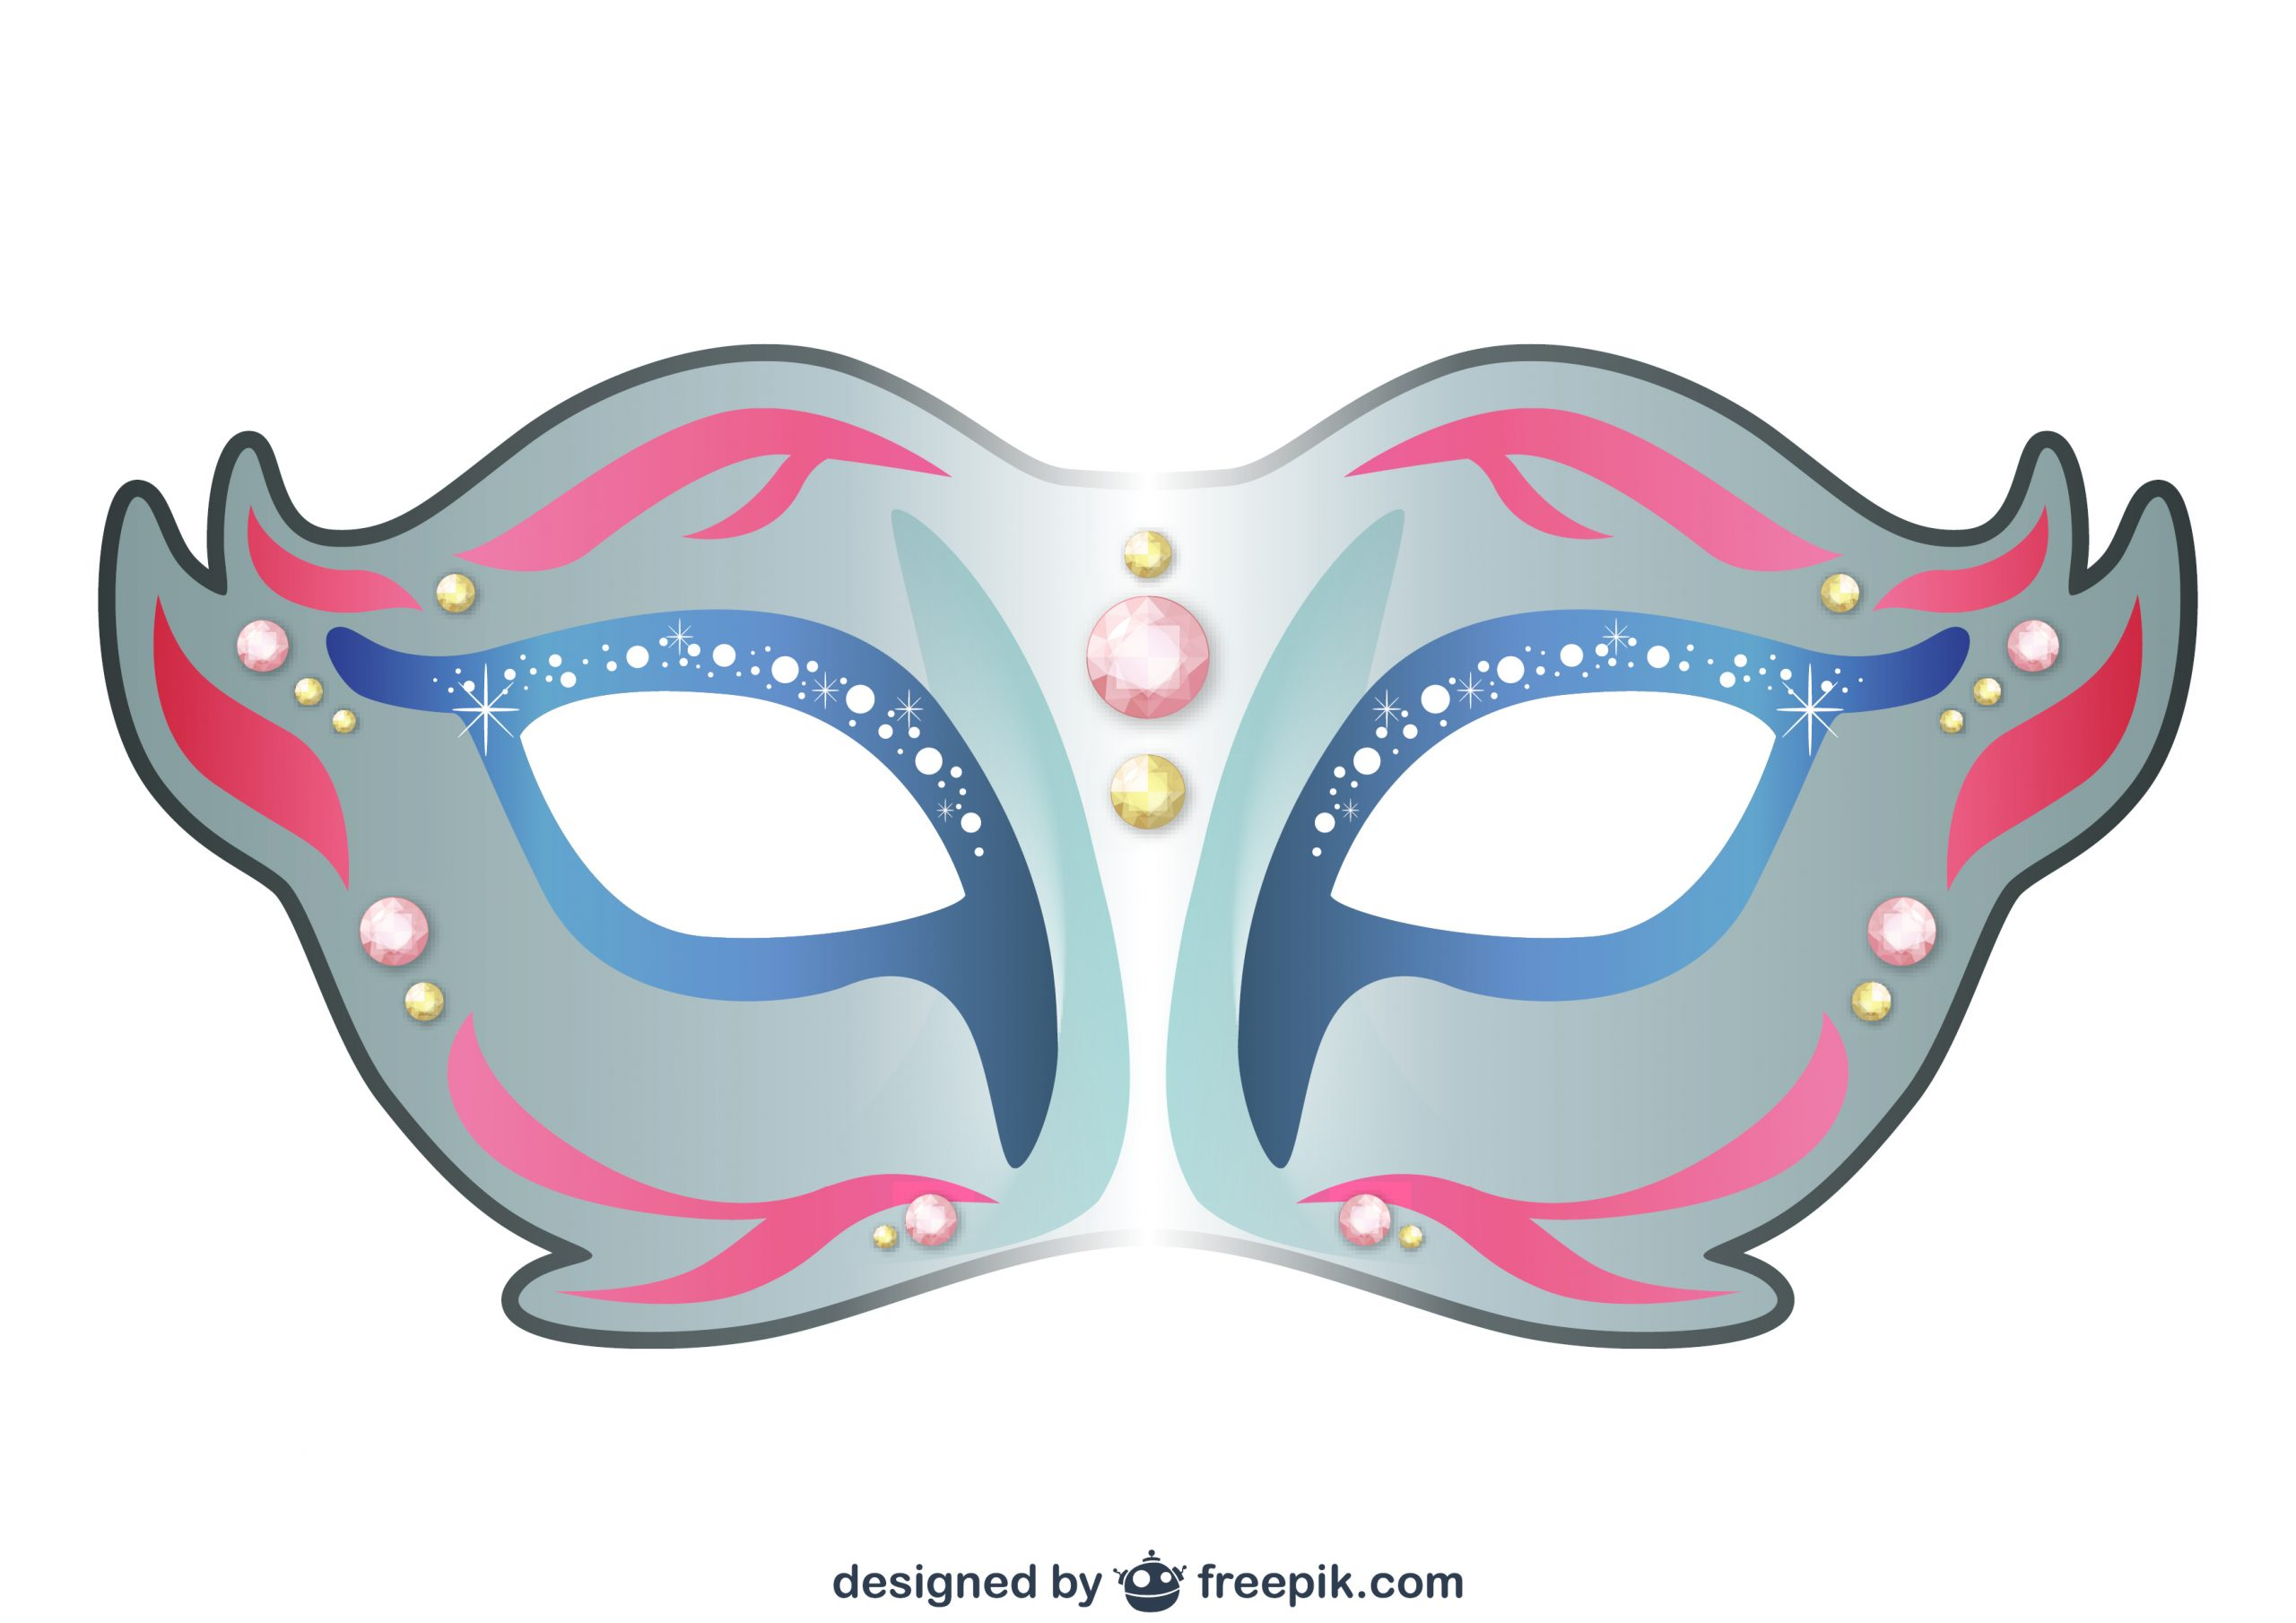 Diy : Les Masques Du Carnaval À Imprimer encequiconcerne Modele Masque De Carnaval A Imprimer